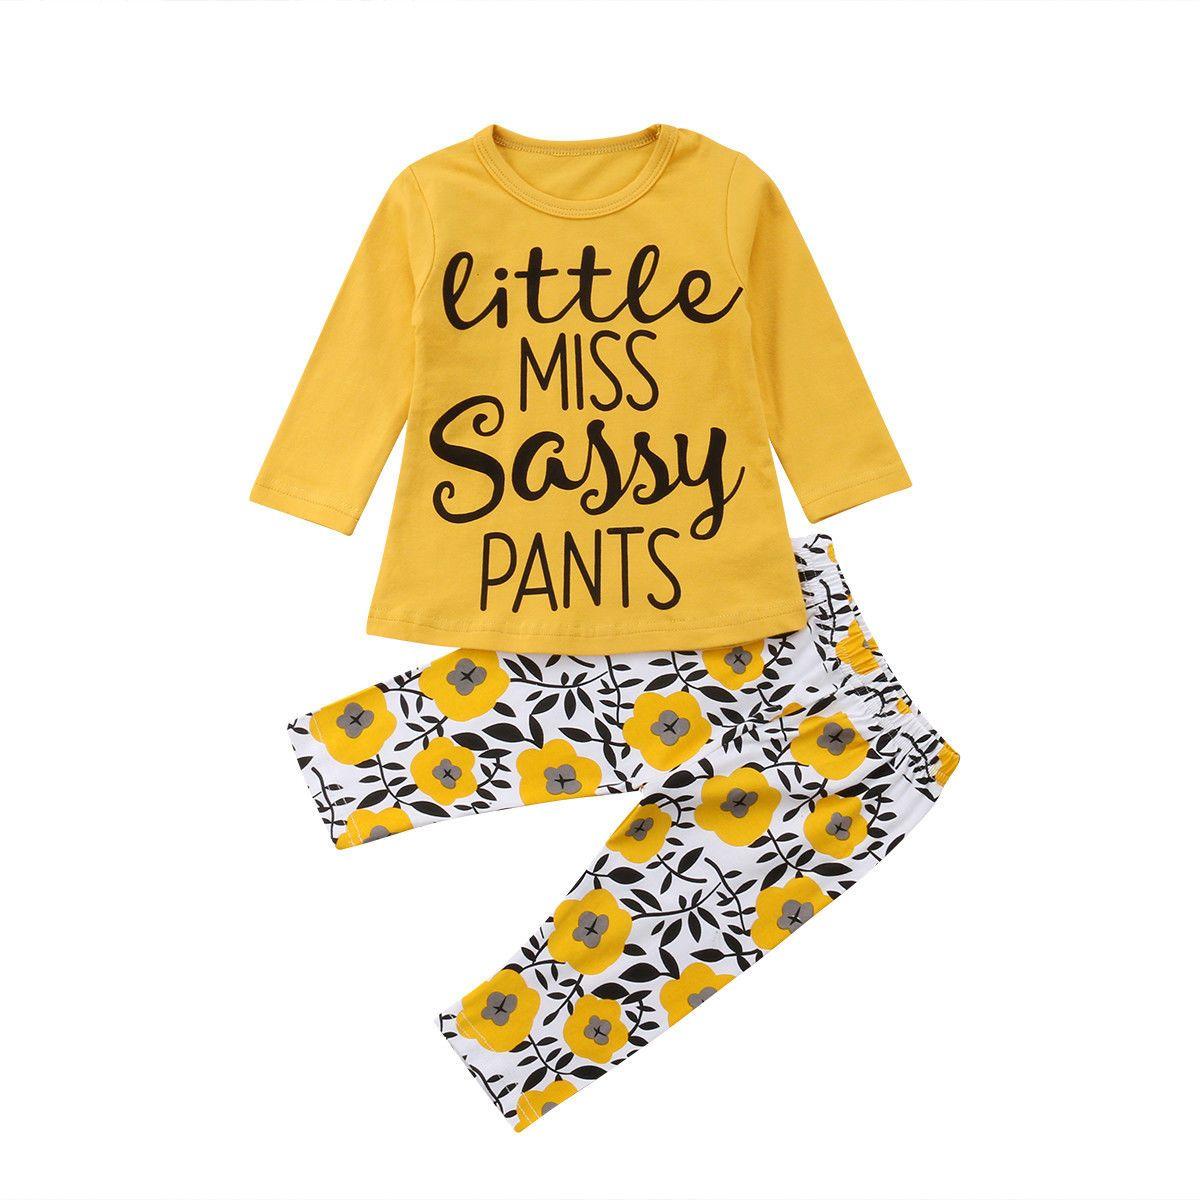 Pants Outfits Set US 2pcs Newborn Toddler Infant Baby Boy Clothes T-shirt Tops